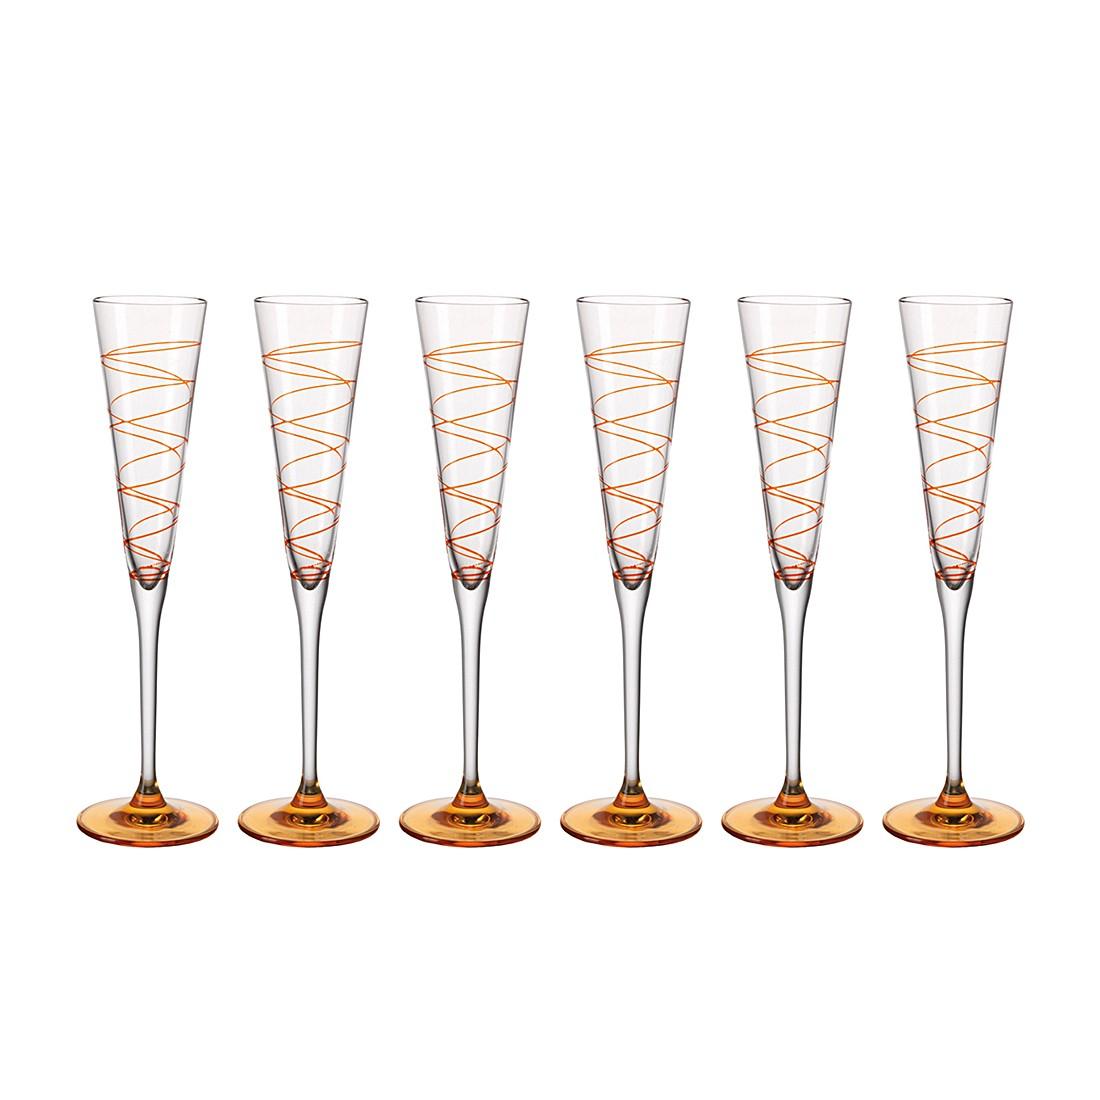 Sektglas Spirale (6er-Set) – Orange, Leonardo online kaufen